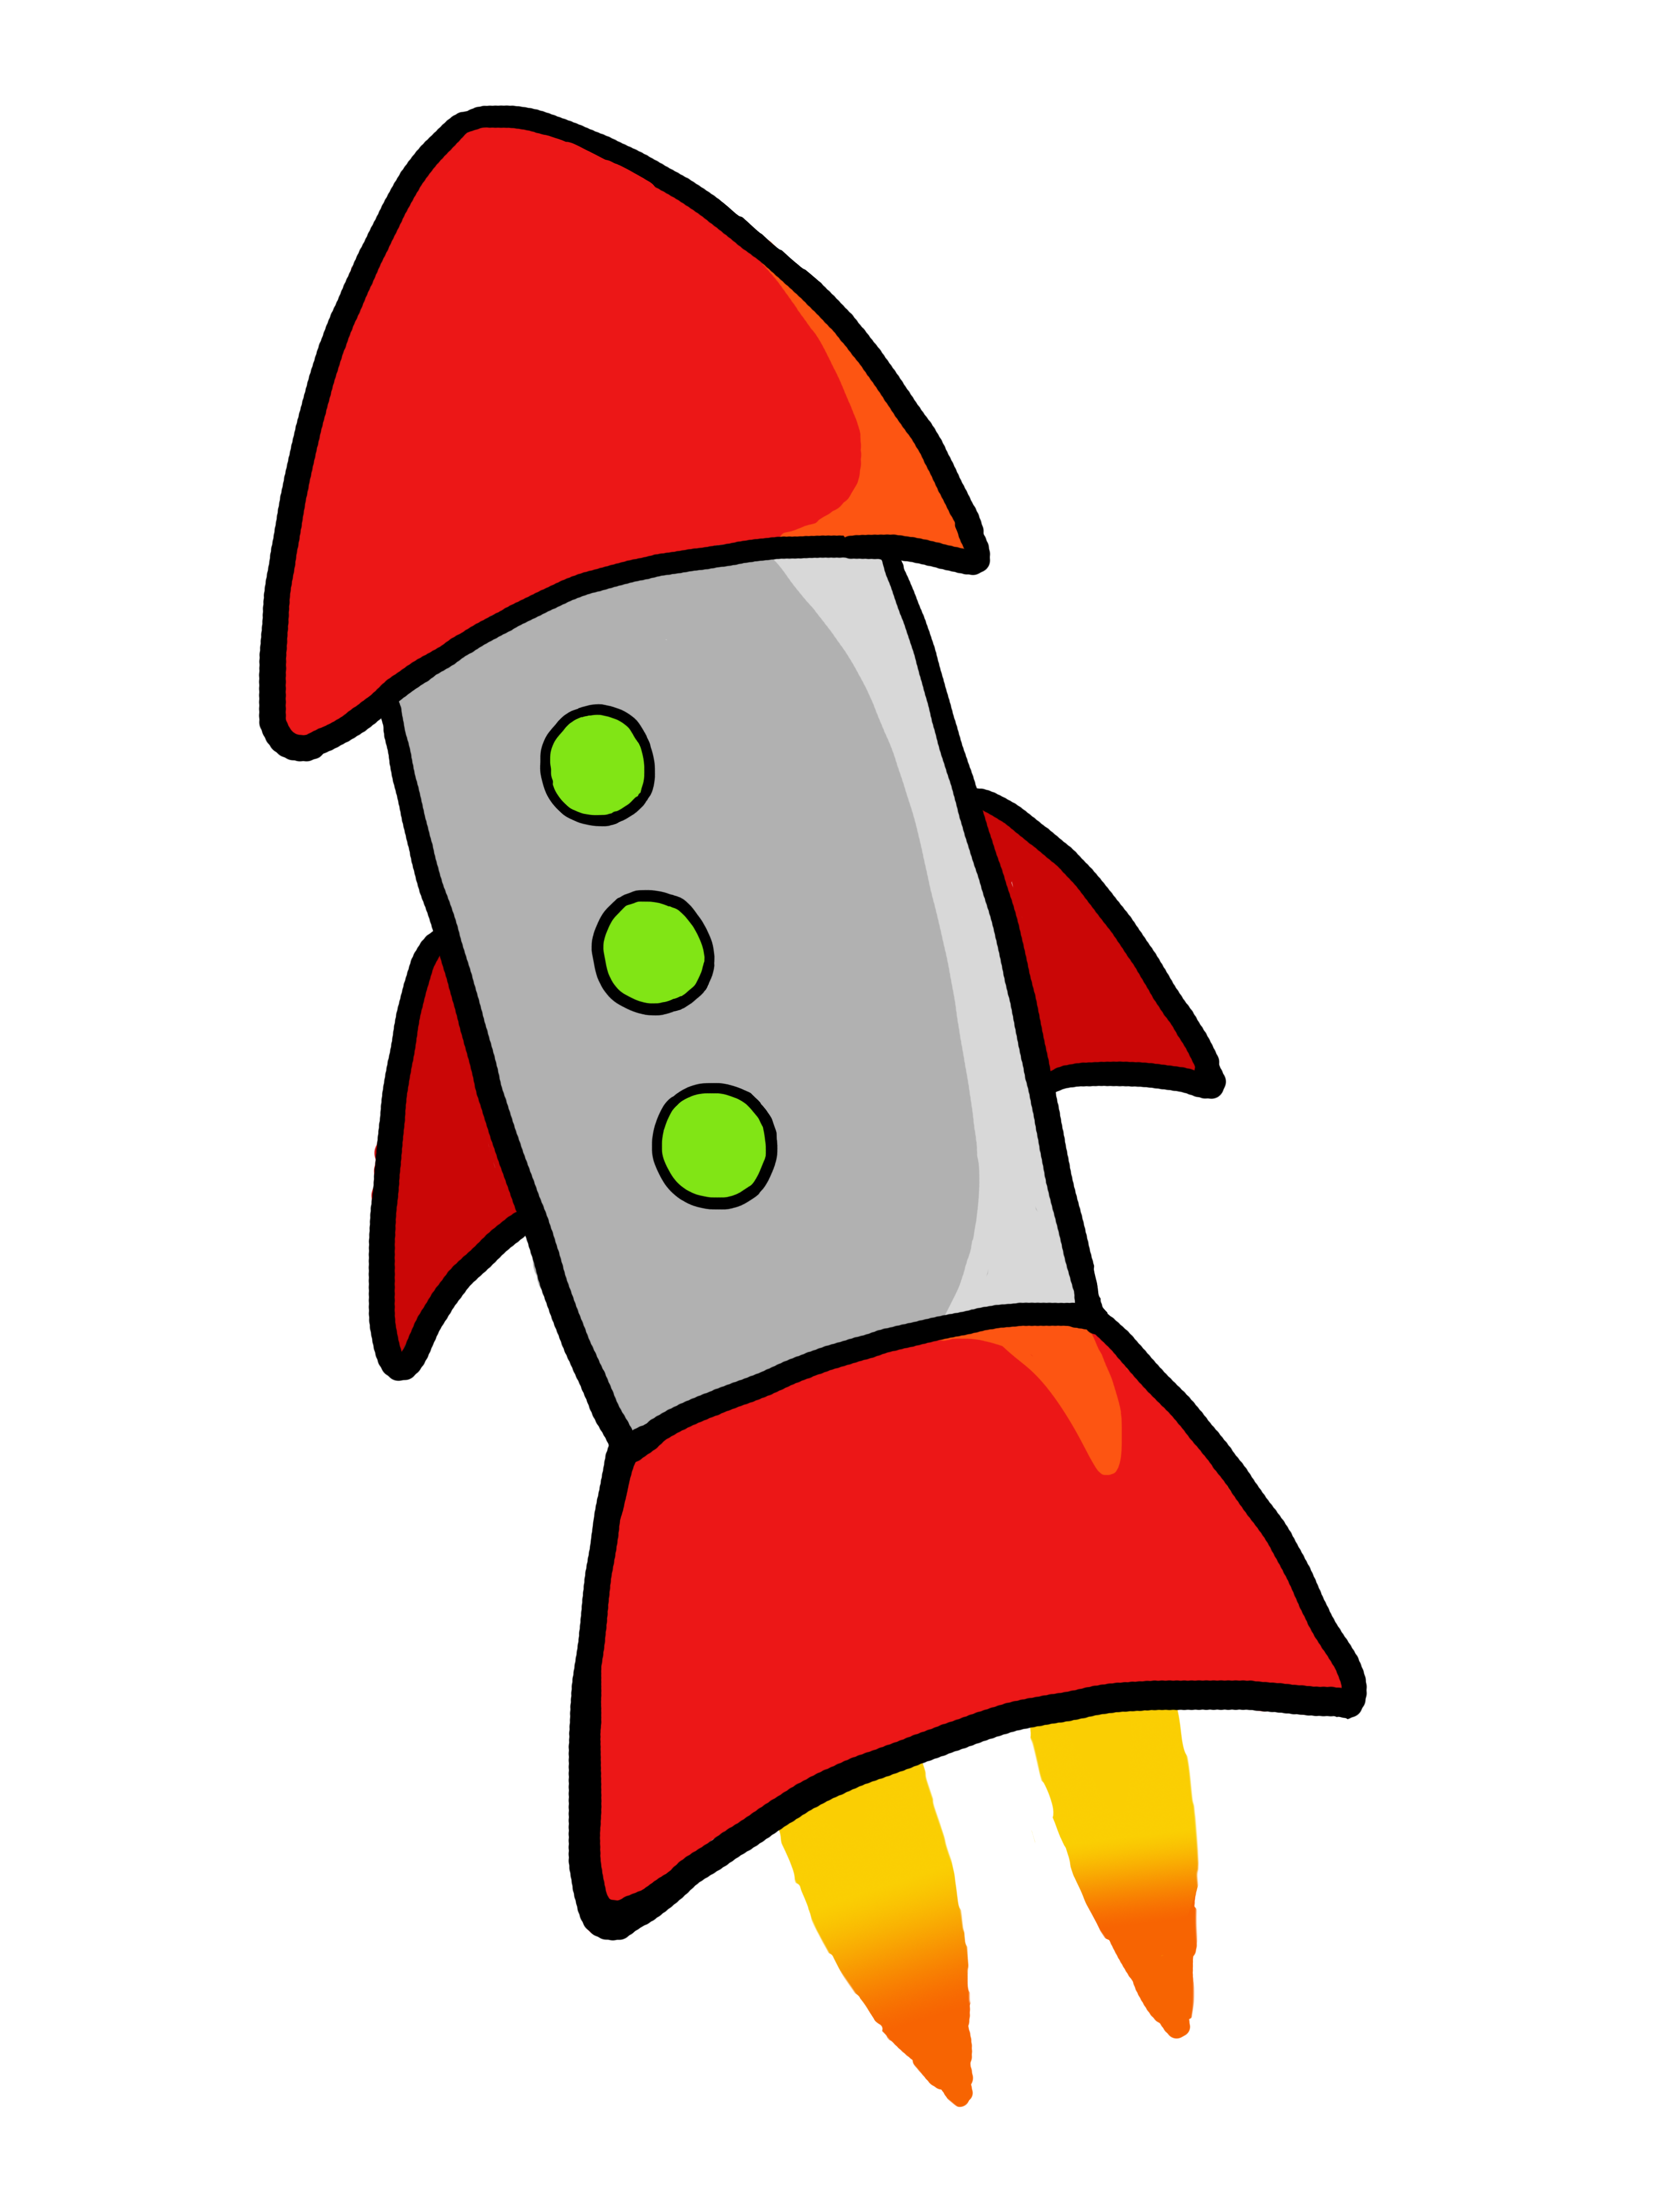 Missile clipart astronaut #7